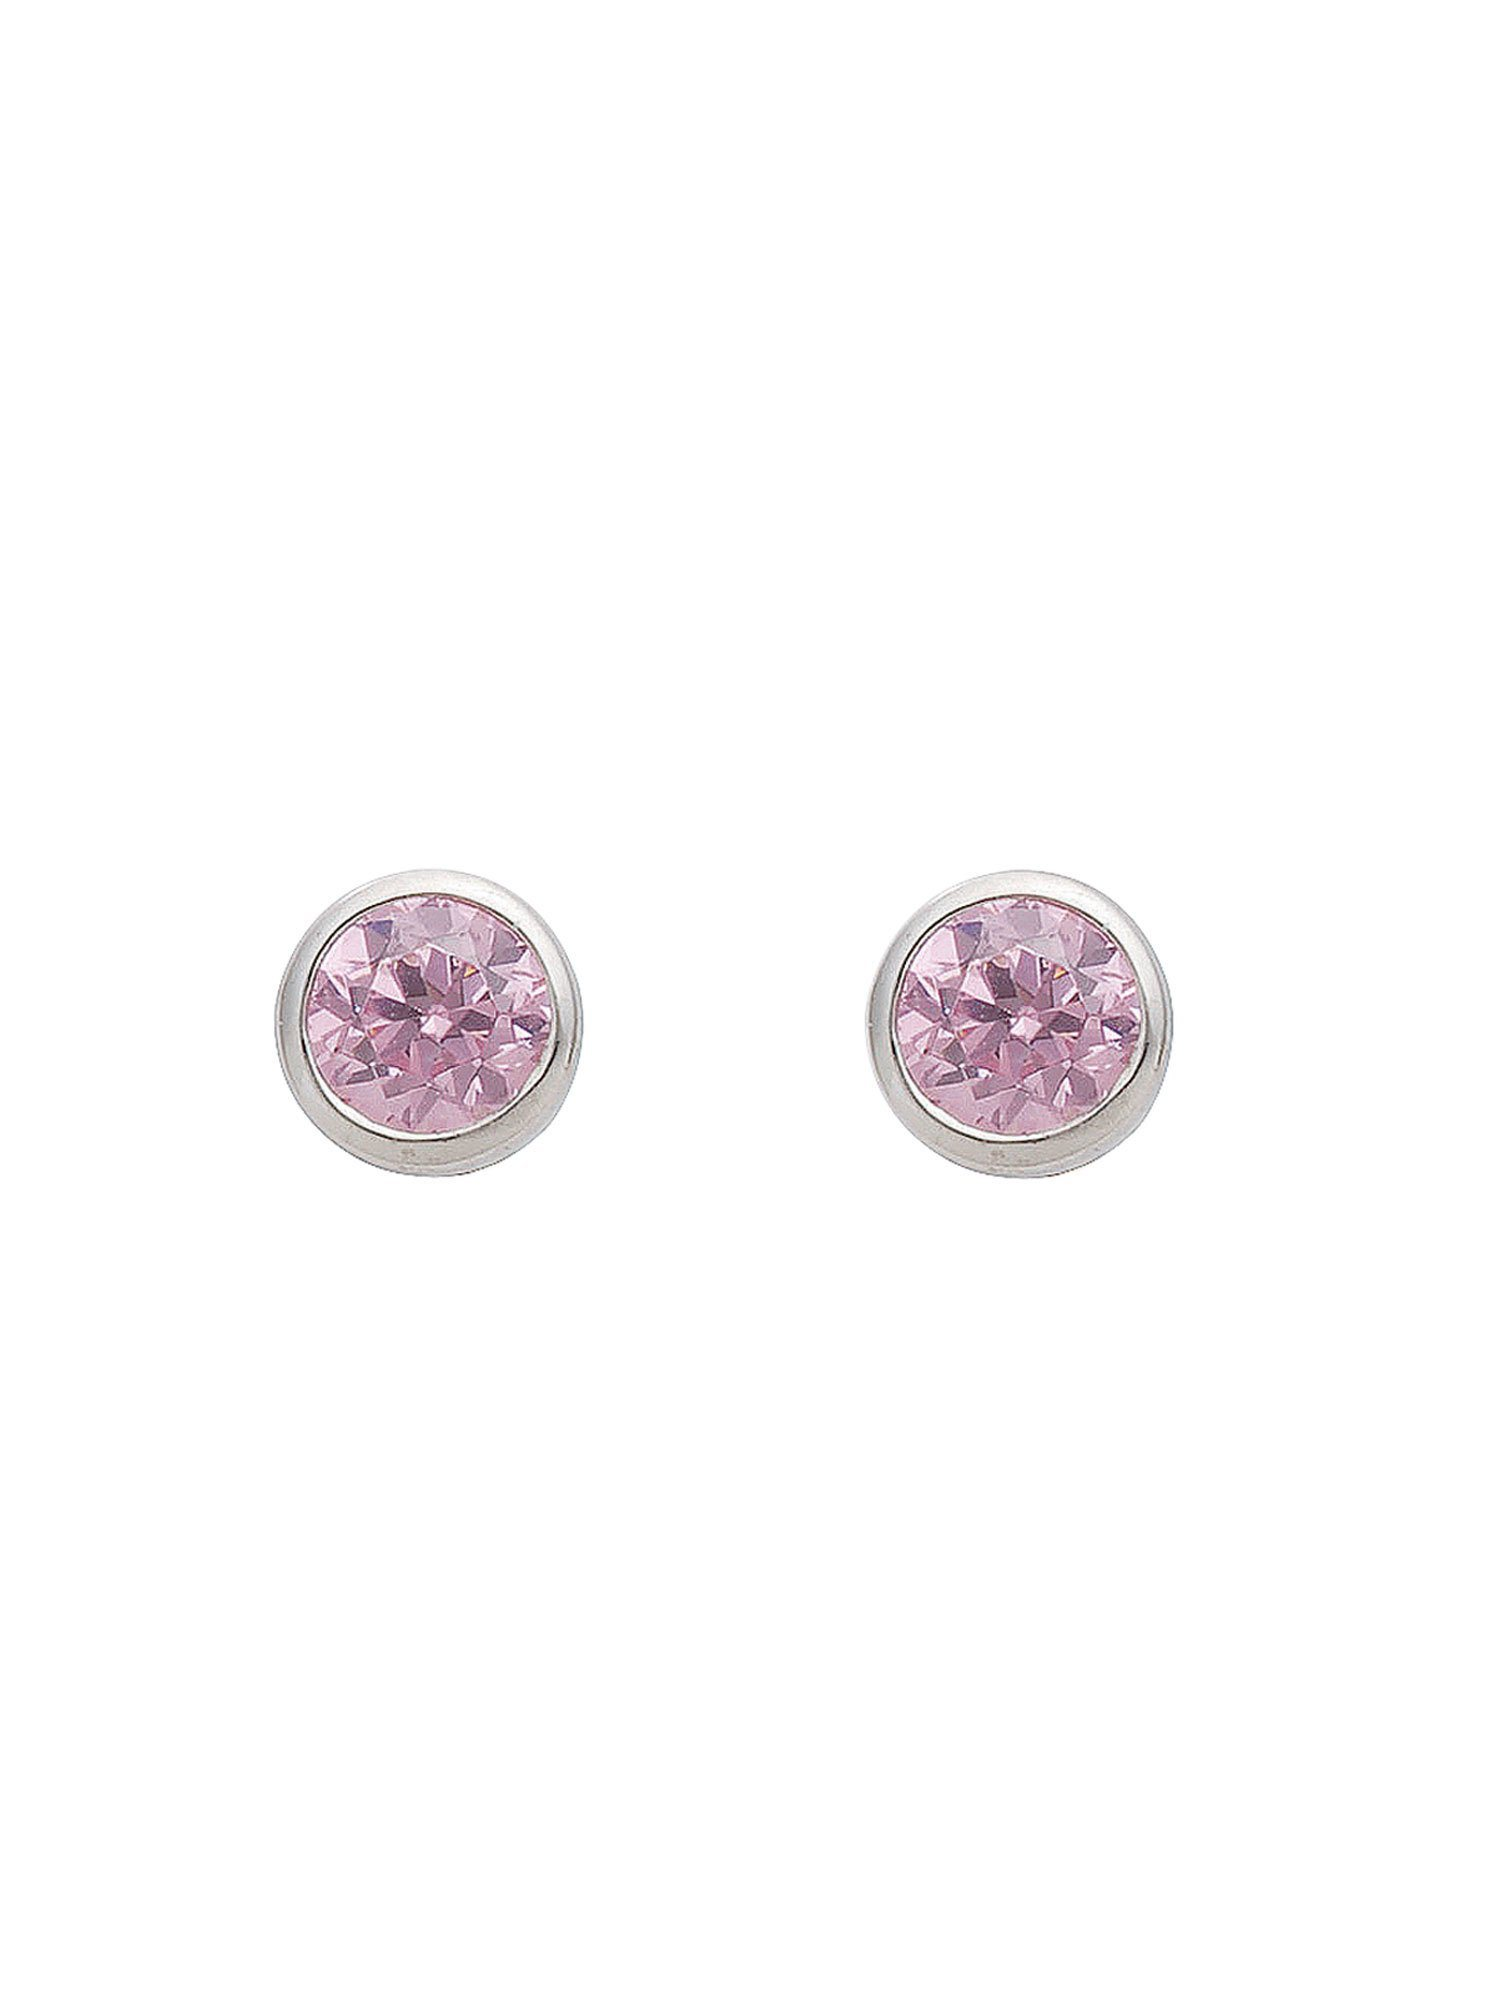 Adelia´s Paar Ohrstecker »Silber Ohrringe« 925 Sterling Silber mit Zirkonia Ø 5 mm | Schmuck > Ohrschmuck & Ohrringe > Ohrstecker | Bunt | Adelia´s